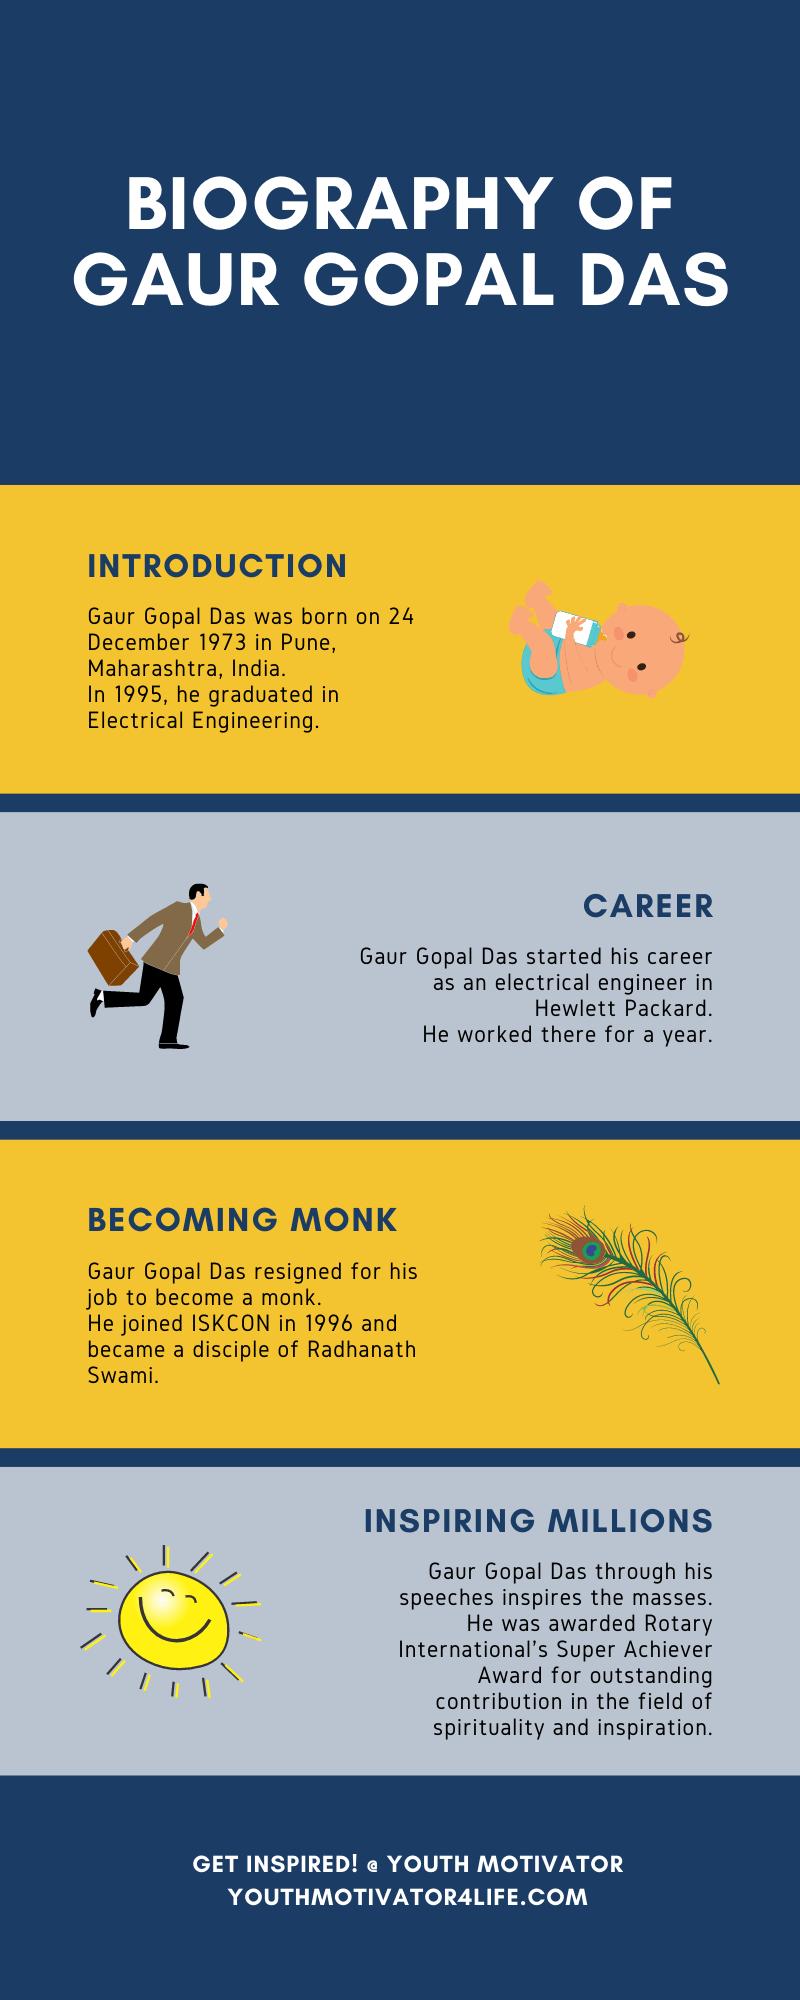 An infographic on biography of Gaur Gopal Das